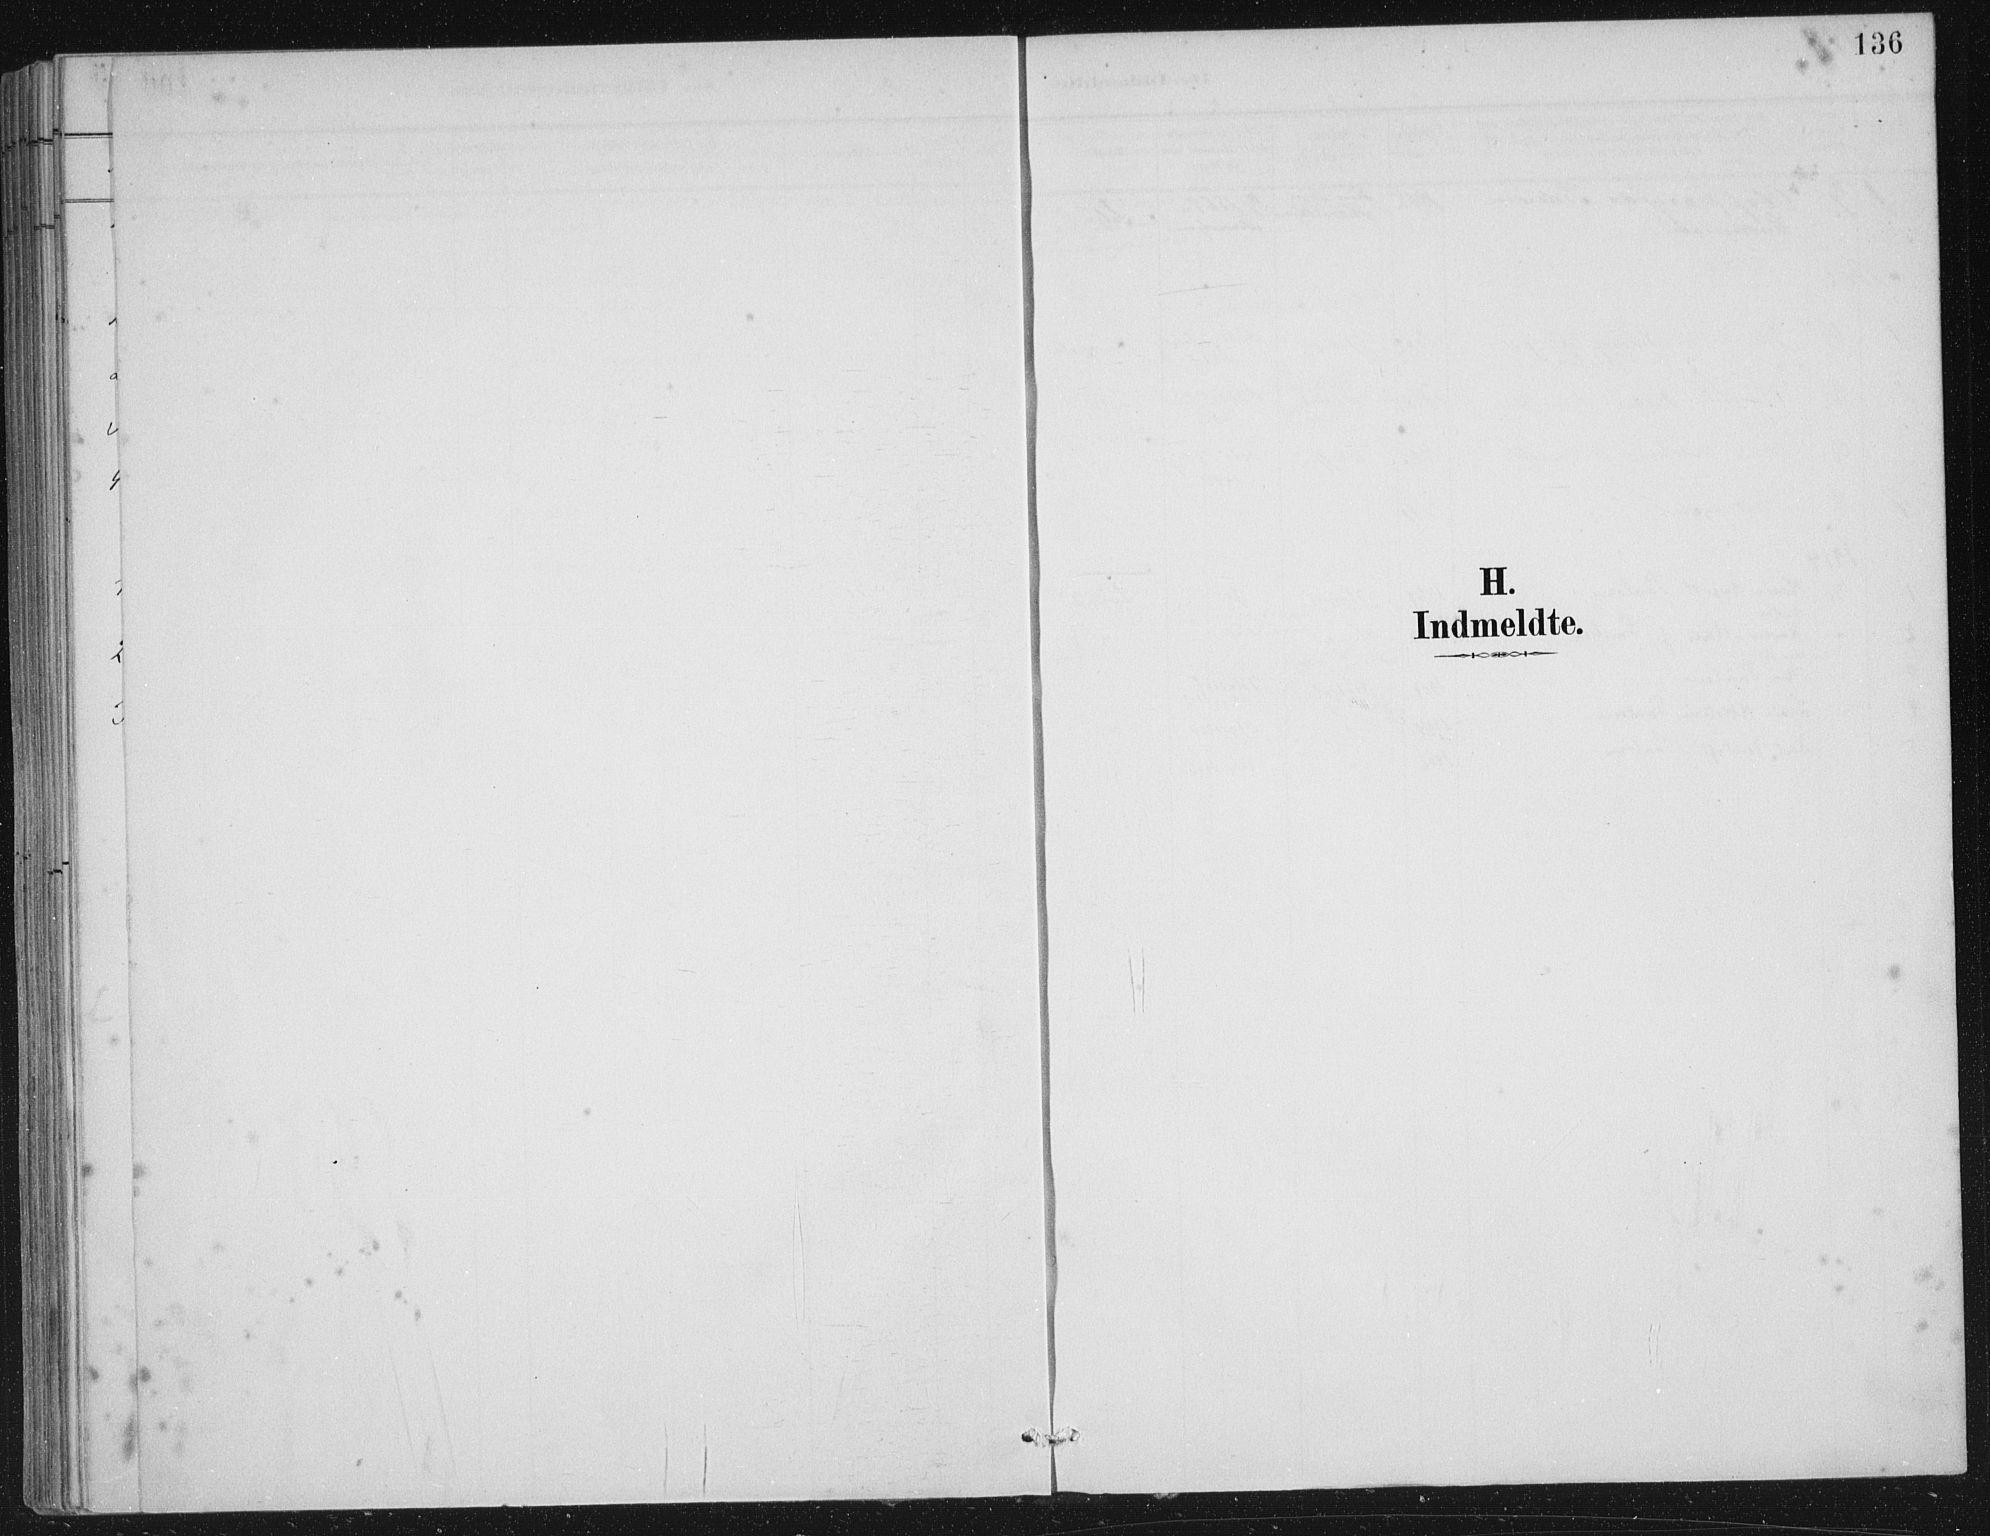 SAB, Kinn sokneprestembete, H/Haa/Haae/L0001: Ministerialbok nr. E 1, 1890-1916, s. 136